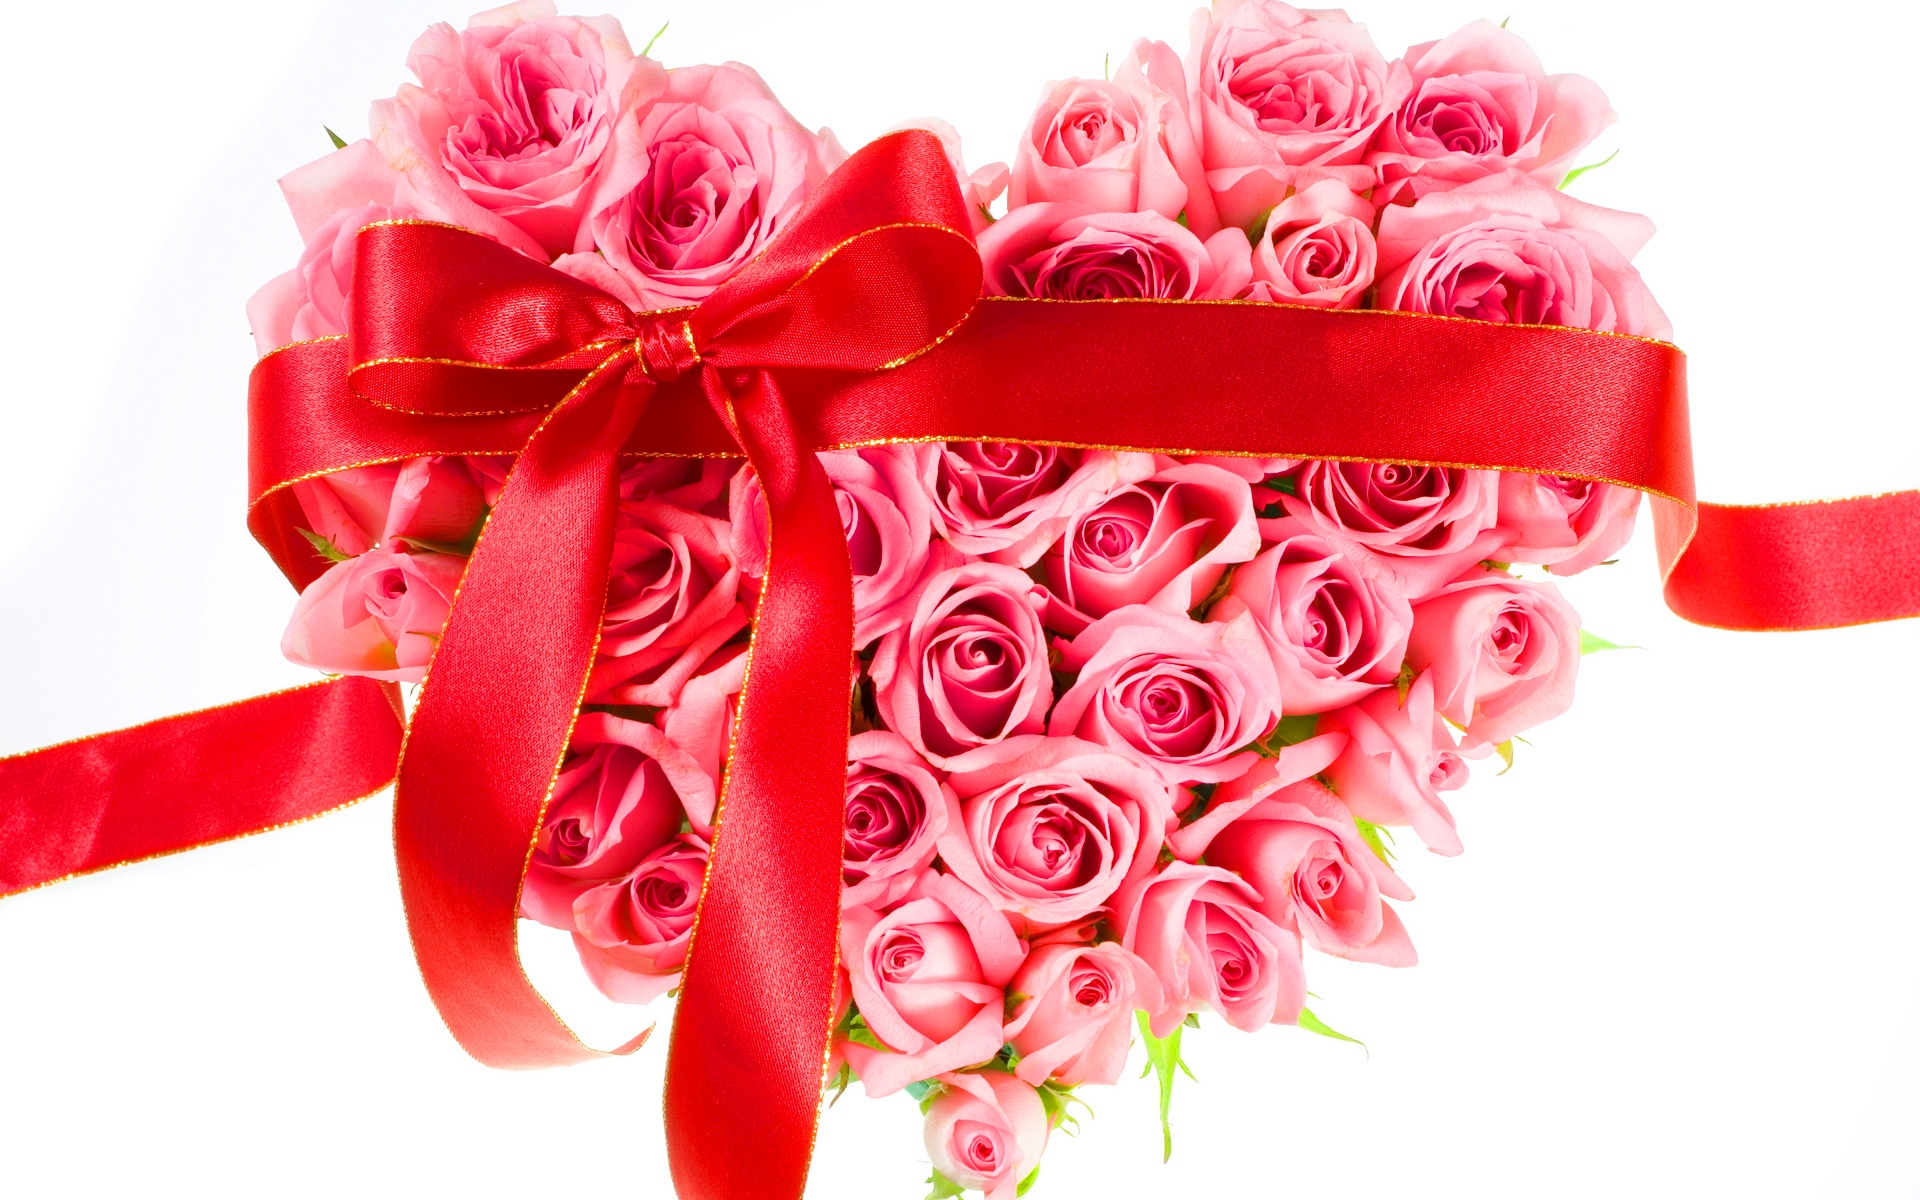 Картинка валентинка » День святого ...: www.kartinki24.ru/kartinki/den-svyatogo-valentina/17683.html